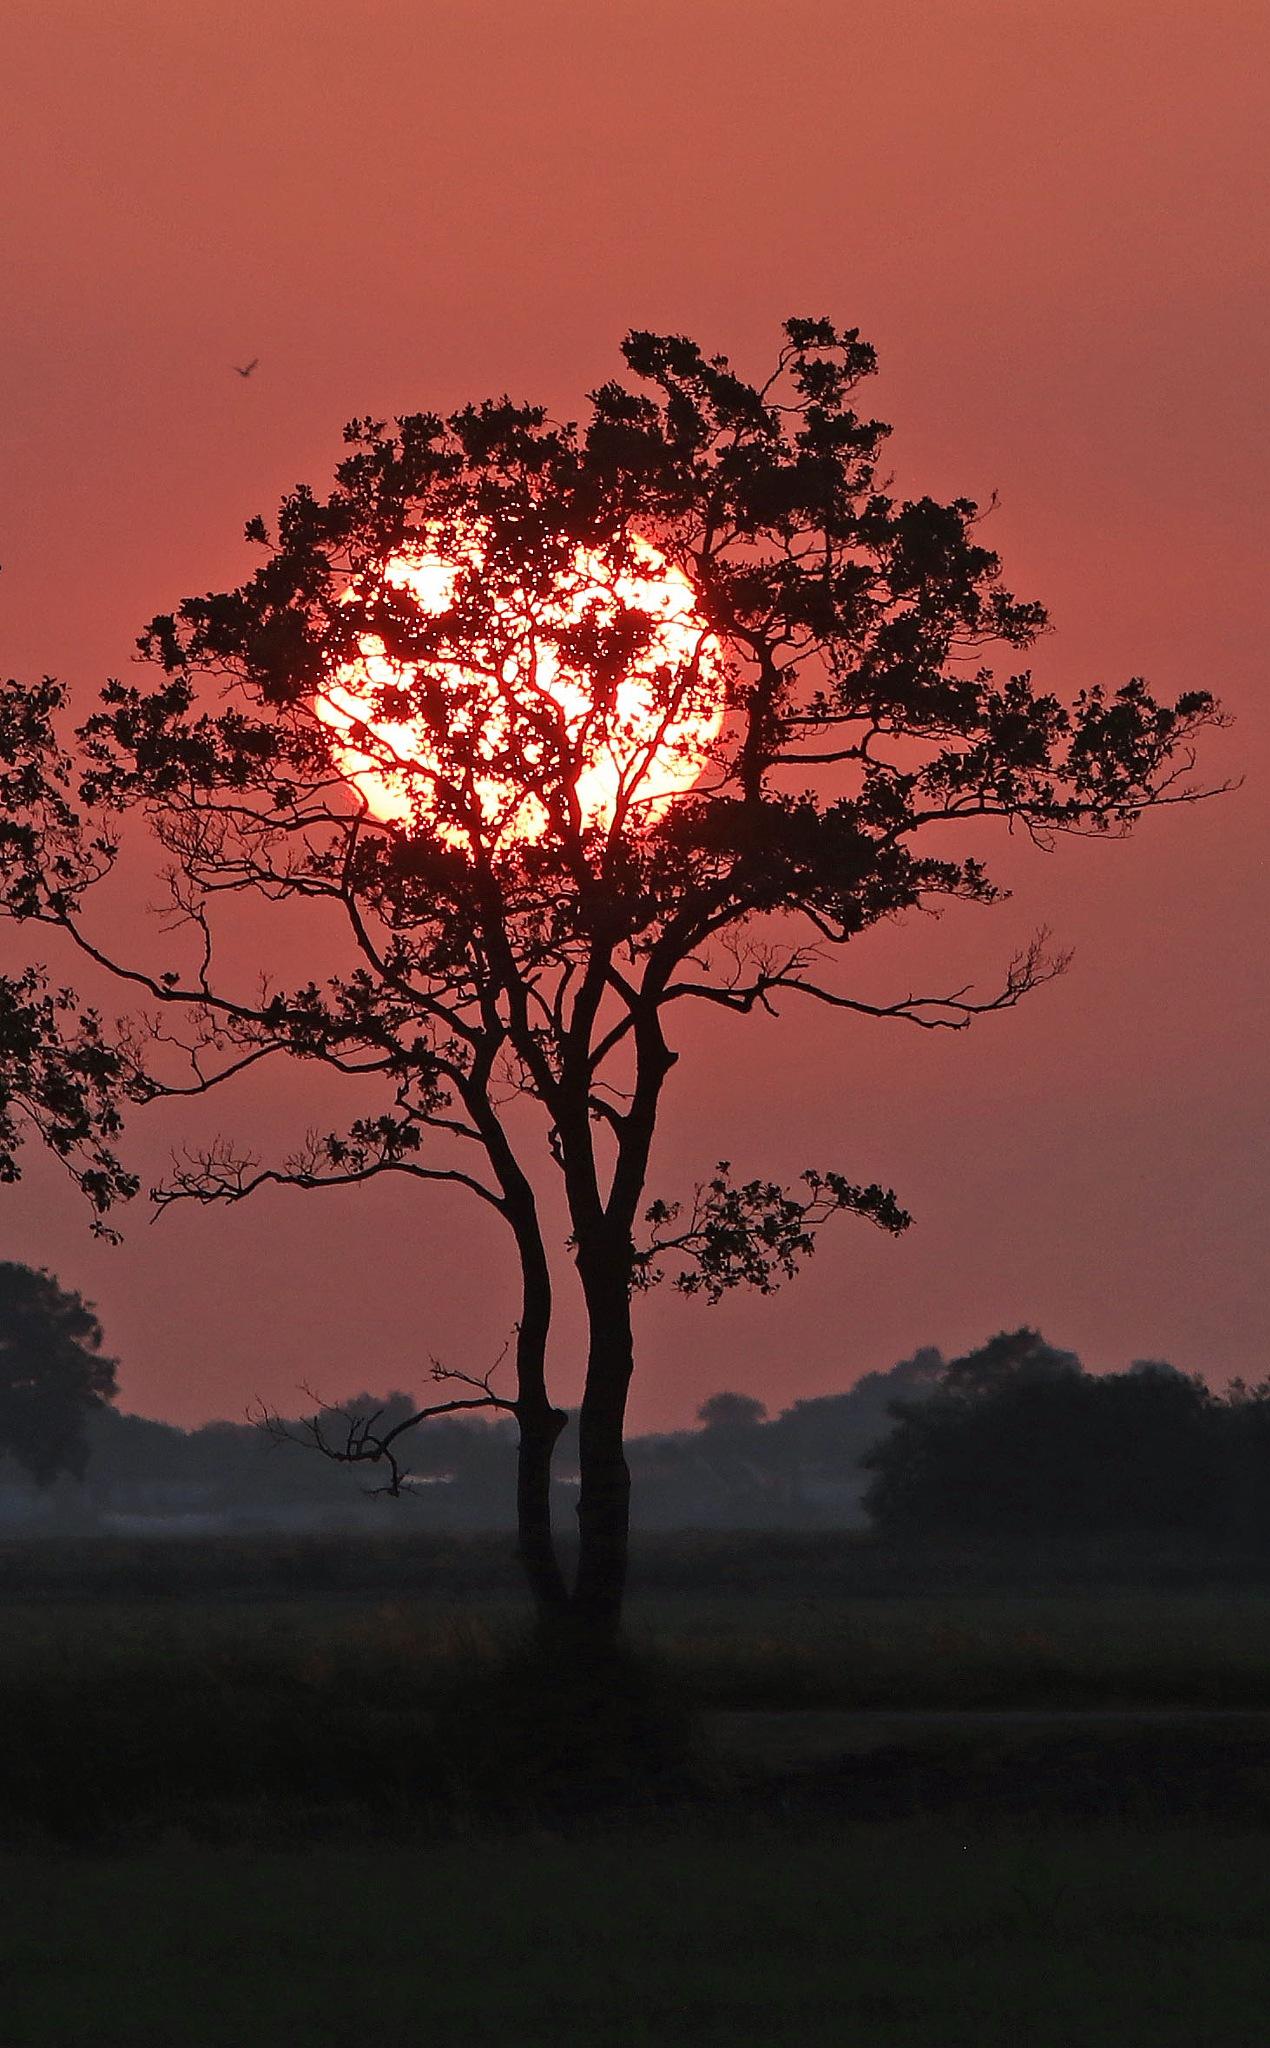 warm sun by Jeroen Wouter van der Vlist